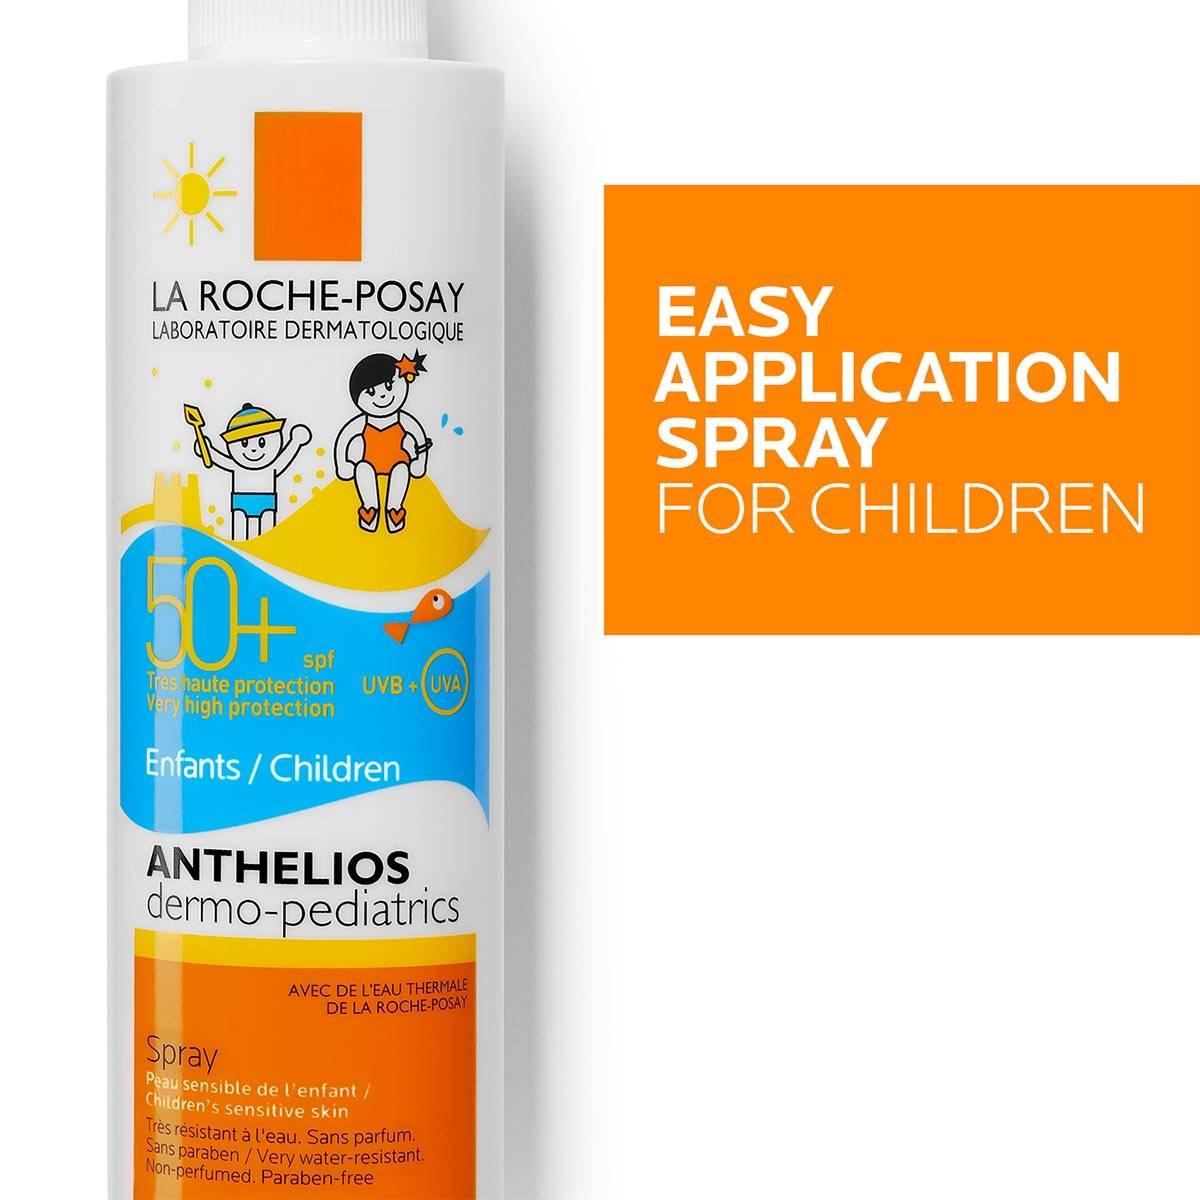 La Roche Posay Tuotesivu Aurinko Anthelios DP Spray Spf50 200ml 33378724